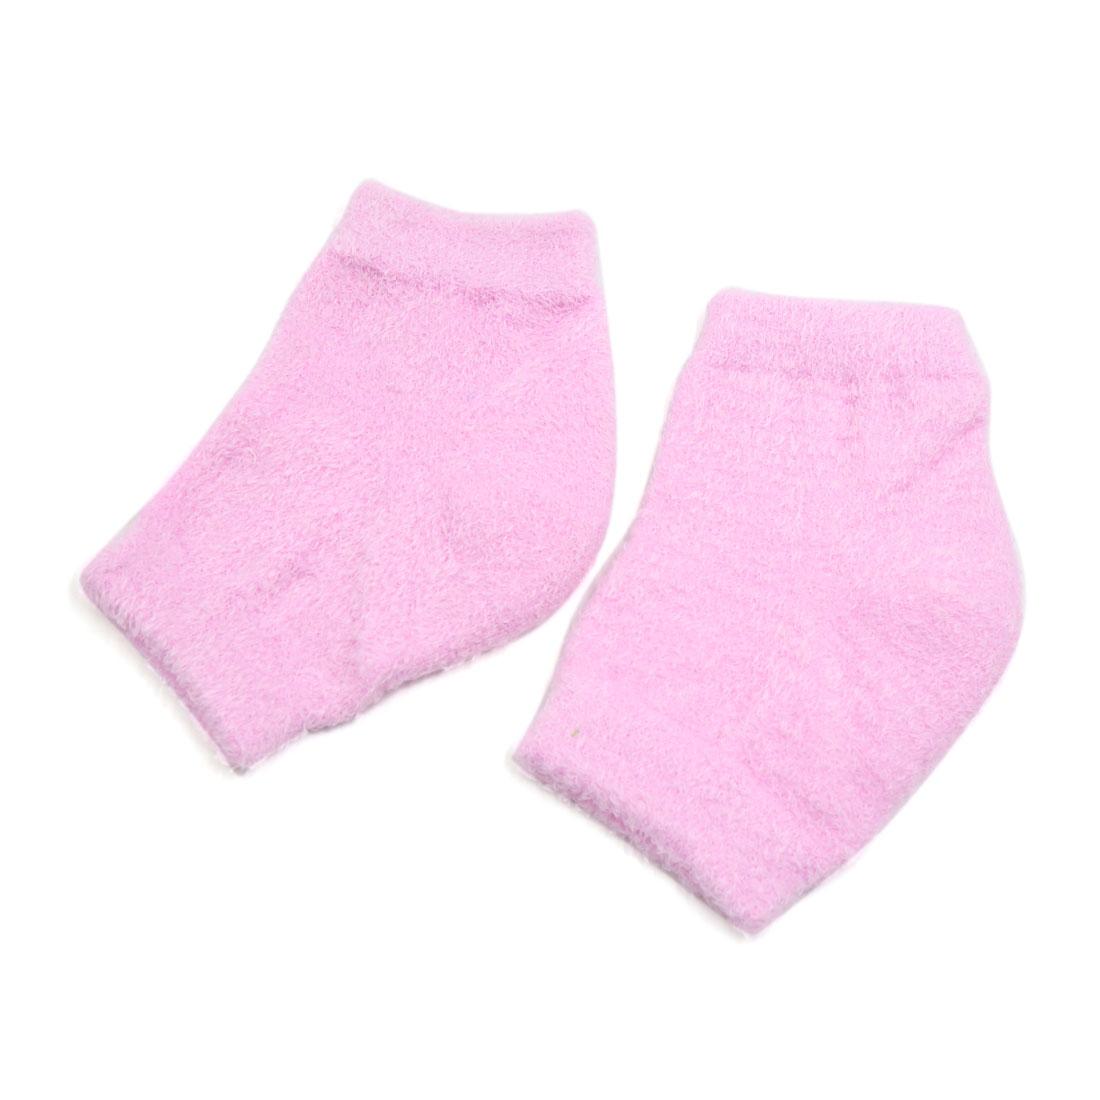 Pink Open Toe Moisturizing Exfoliating Dry Skin Recovery Gel Heel Socks 1 Pair